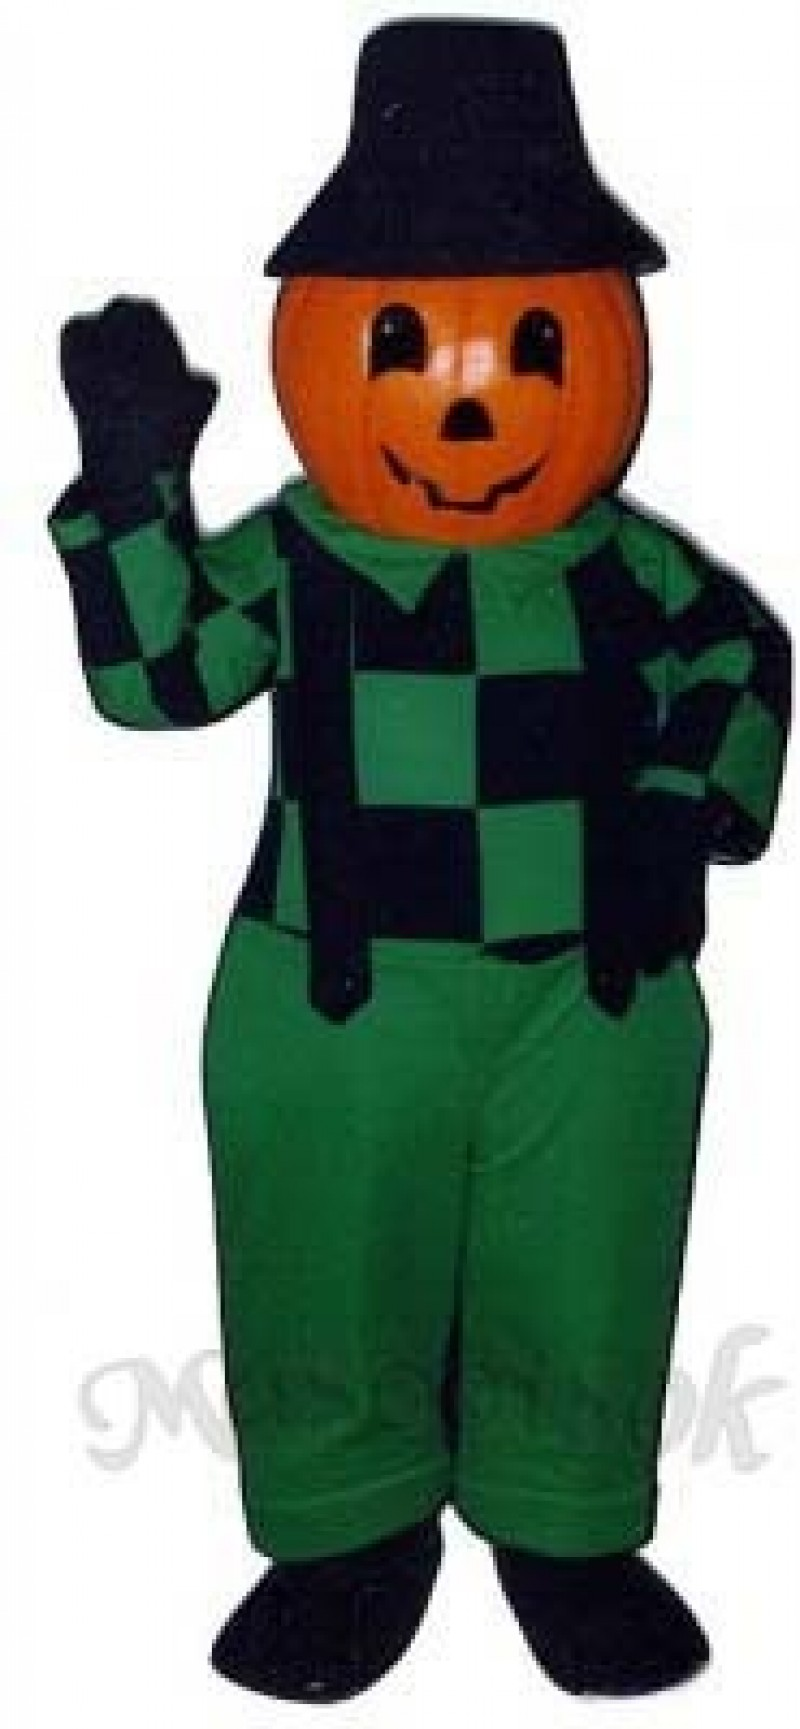 Blinkey Pumpkin Mascot Costume